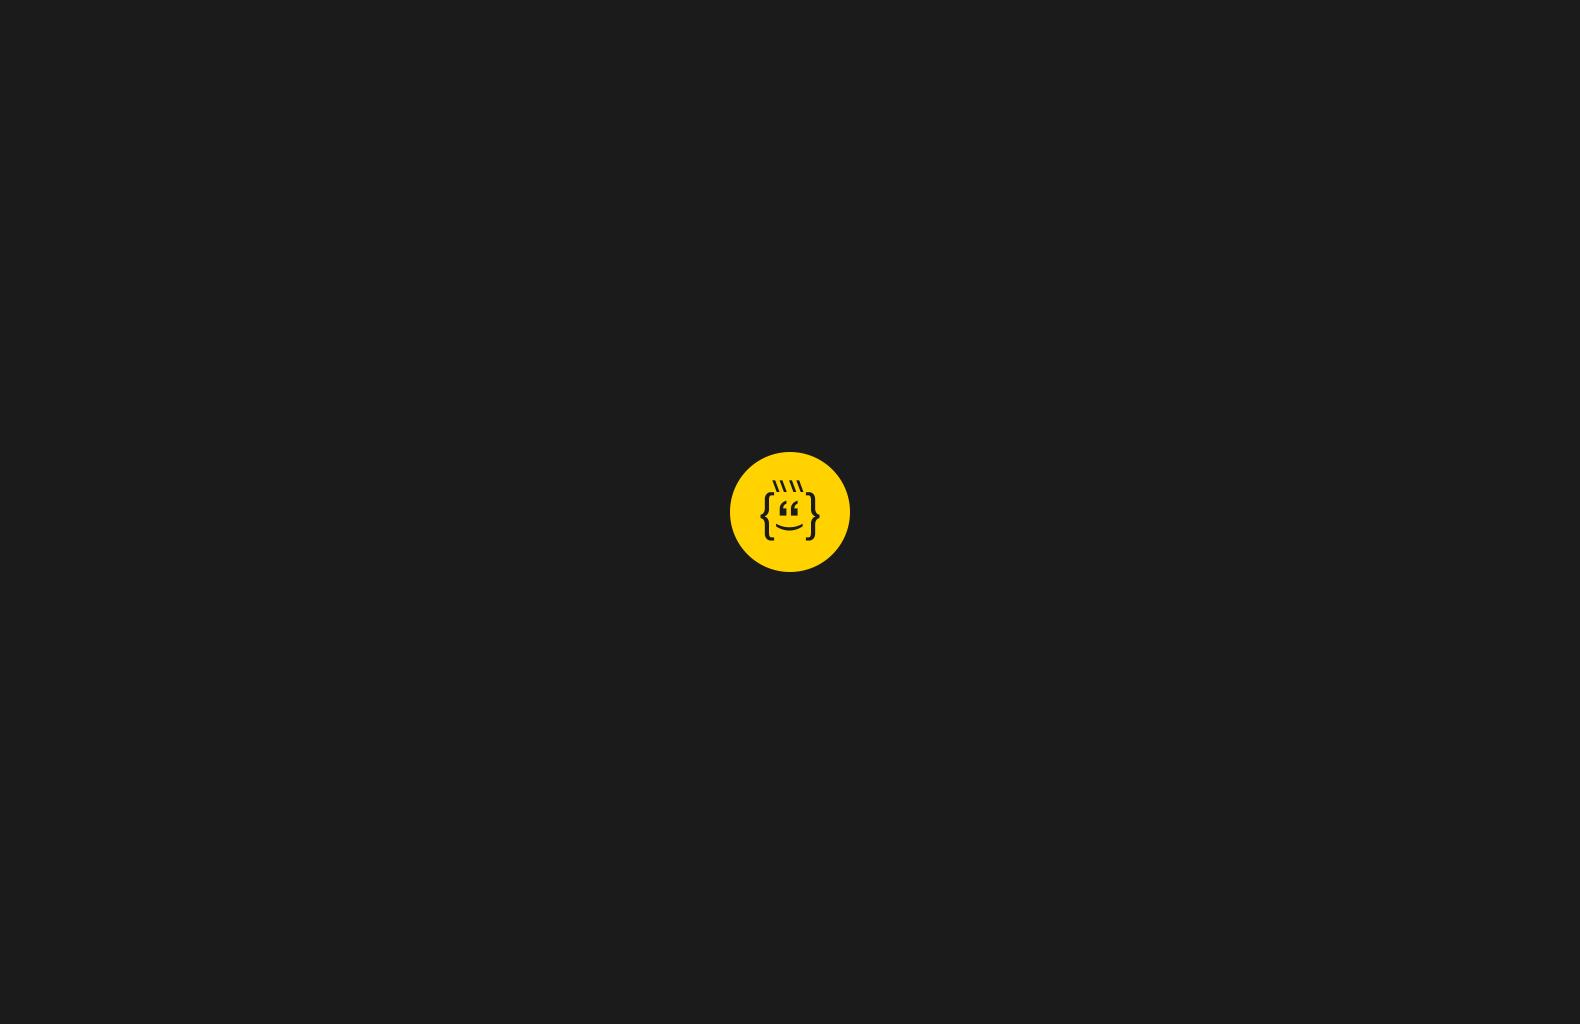 fir.im的网站截图